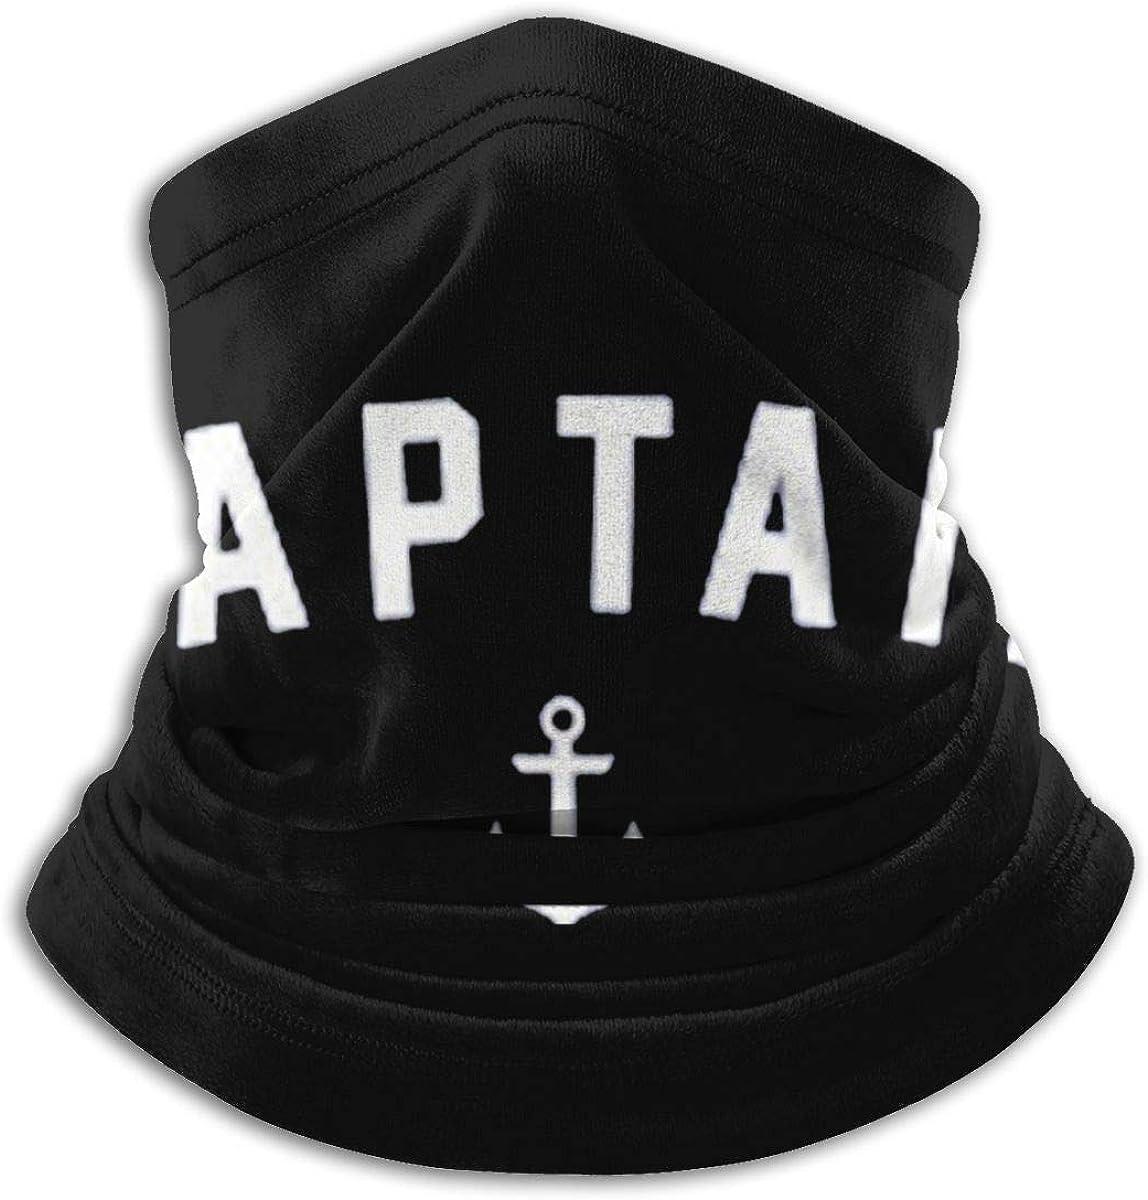 Captain Sailing Boat Black Multi-function Neck Warmer Gaiter Polyester Neck Warmer Windproof Winter Neck Gaiter Cold Weather Scarf For Men Women